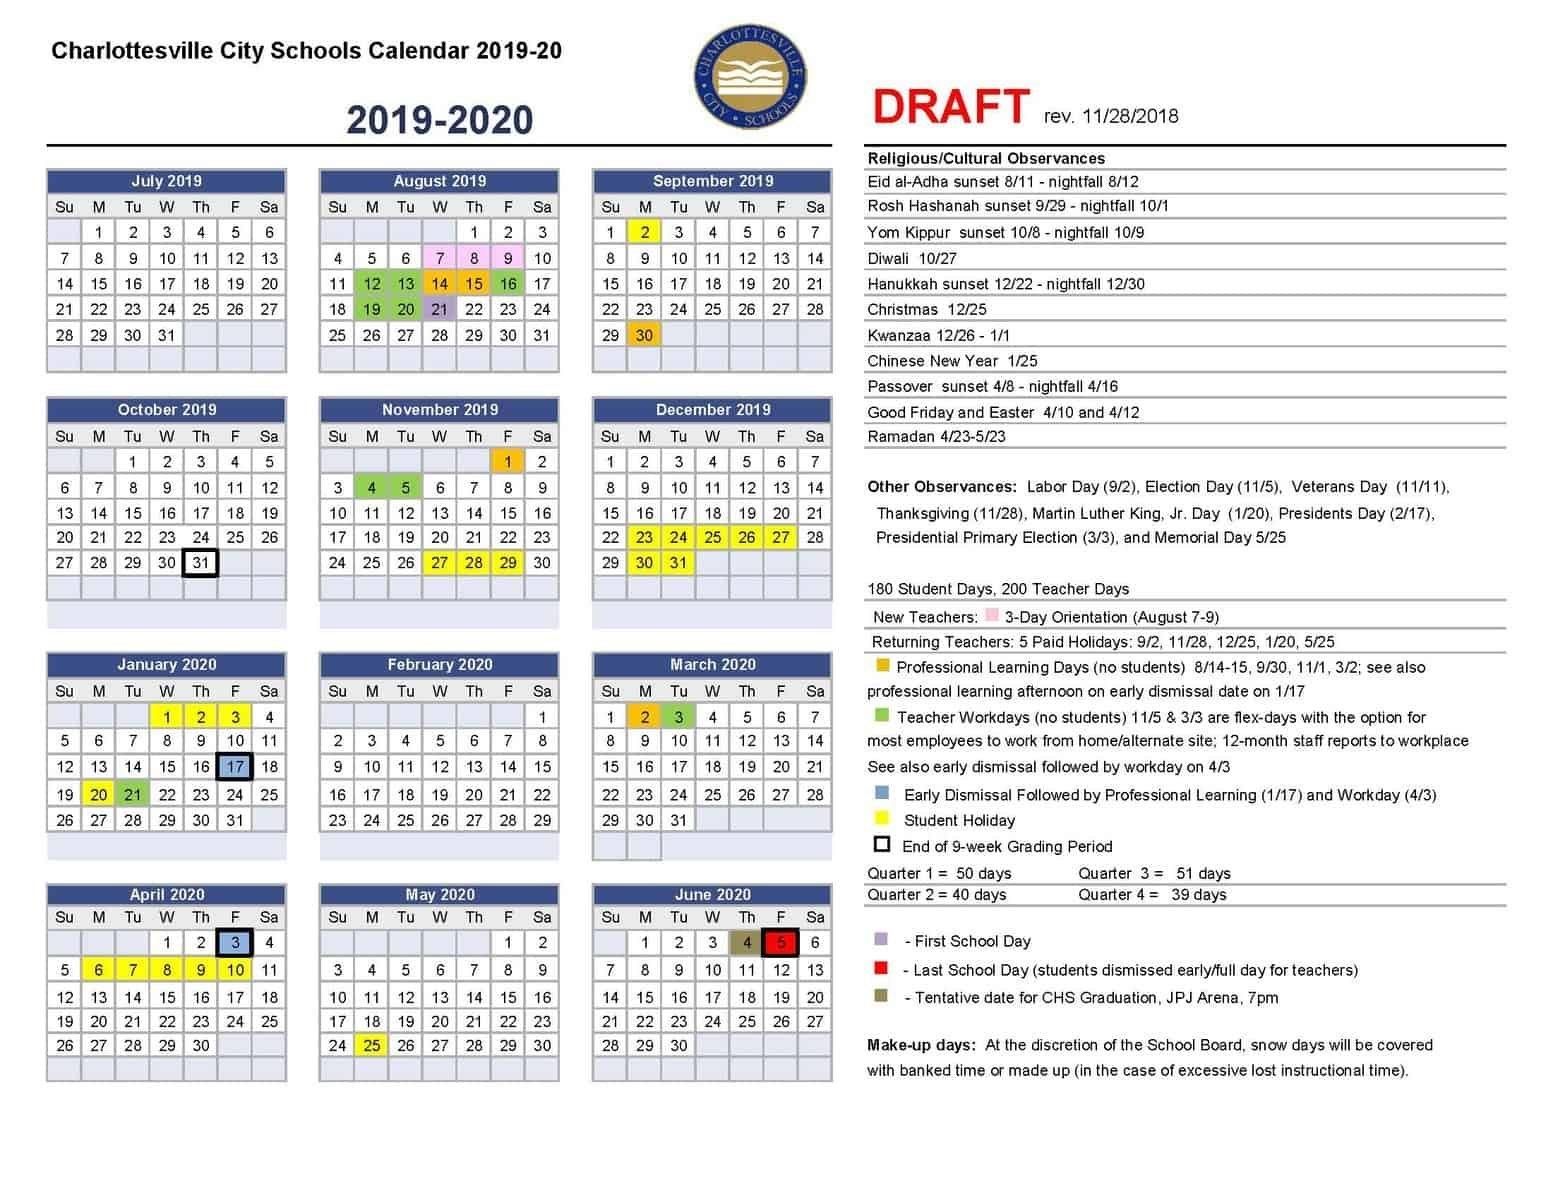 Draft Calendar For 2019-20   Charlottesville City Schools Calendar 2019 20